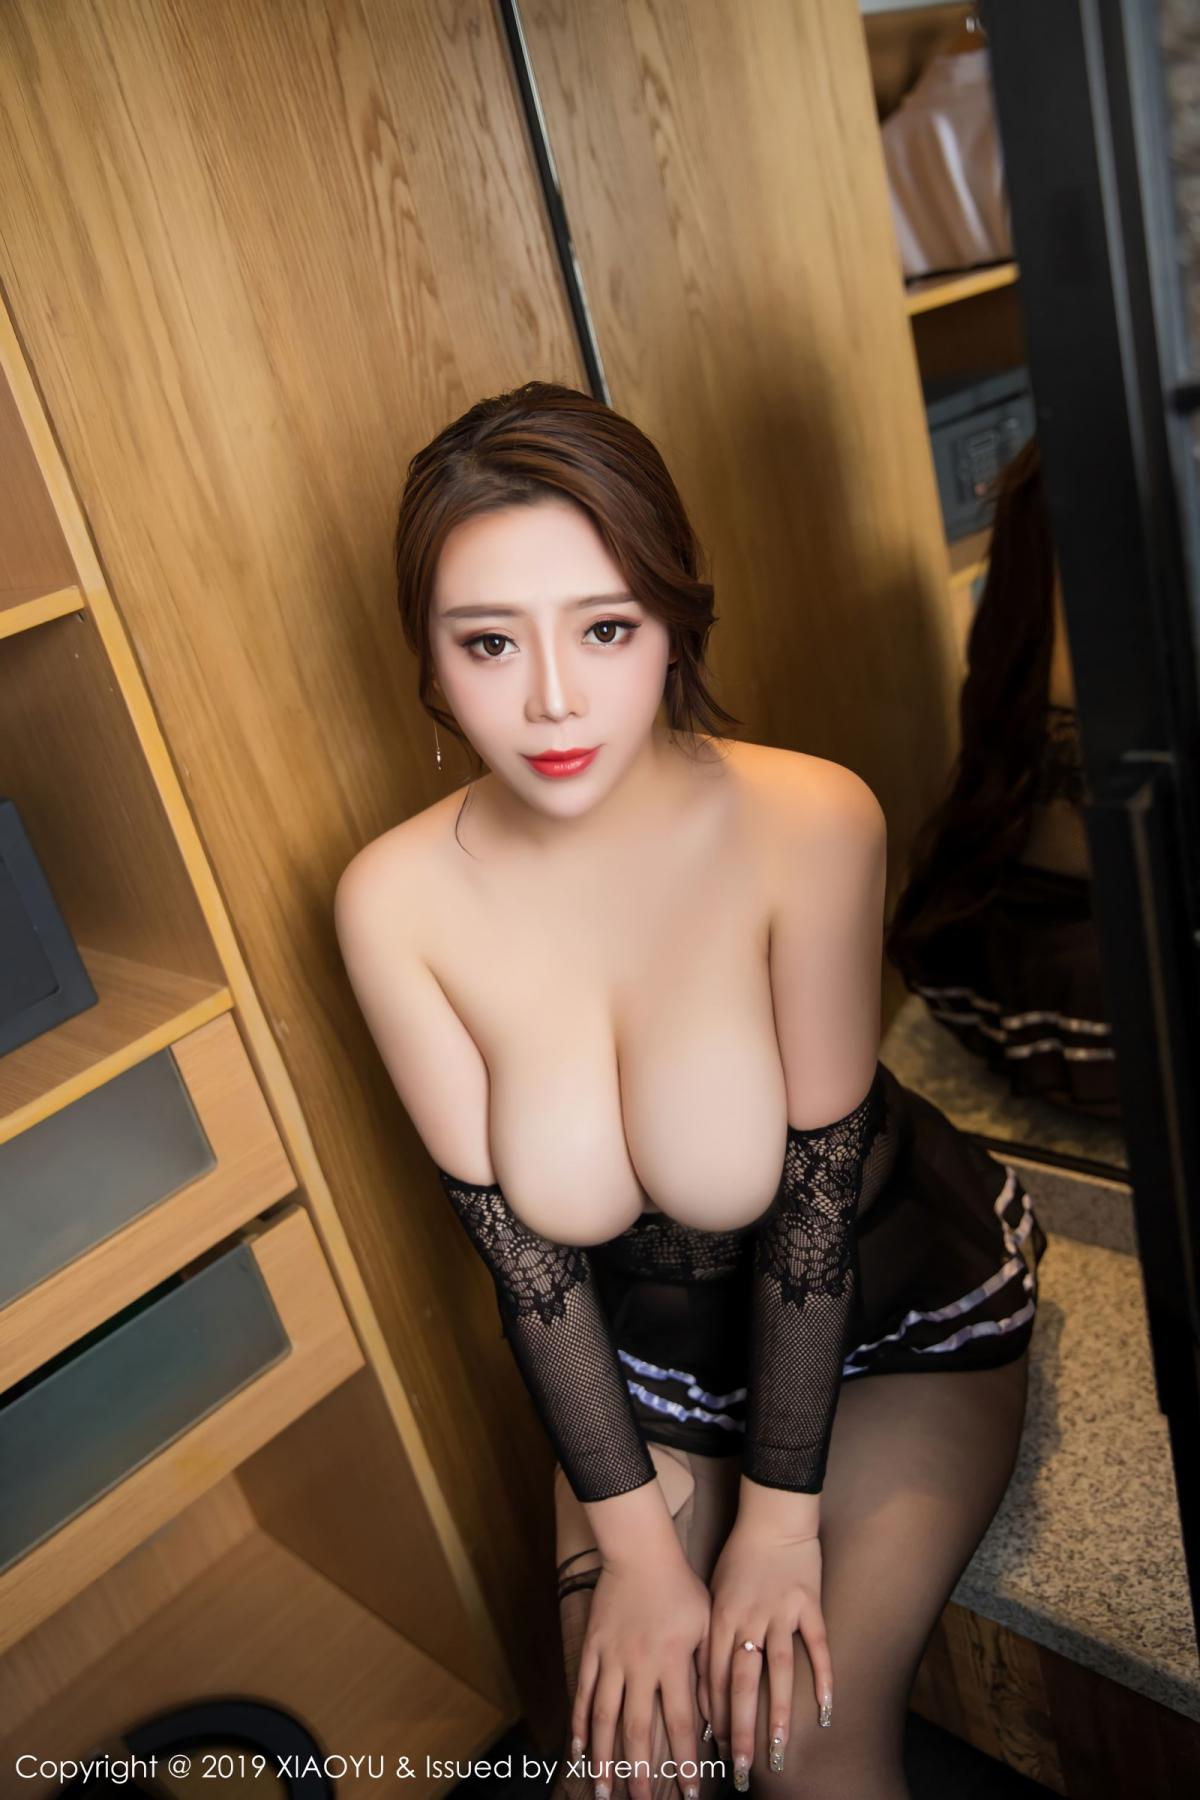 [XiaoYu] Vol.016 Miki Tu 35P, Miki Tu, Tall, XiaoYu